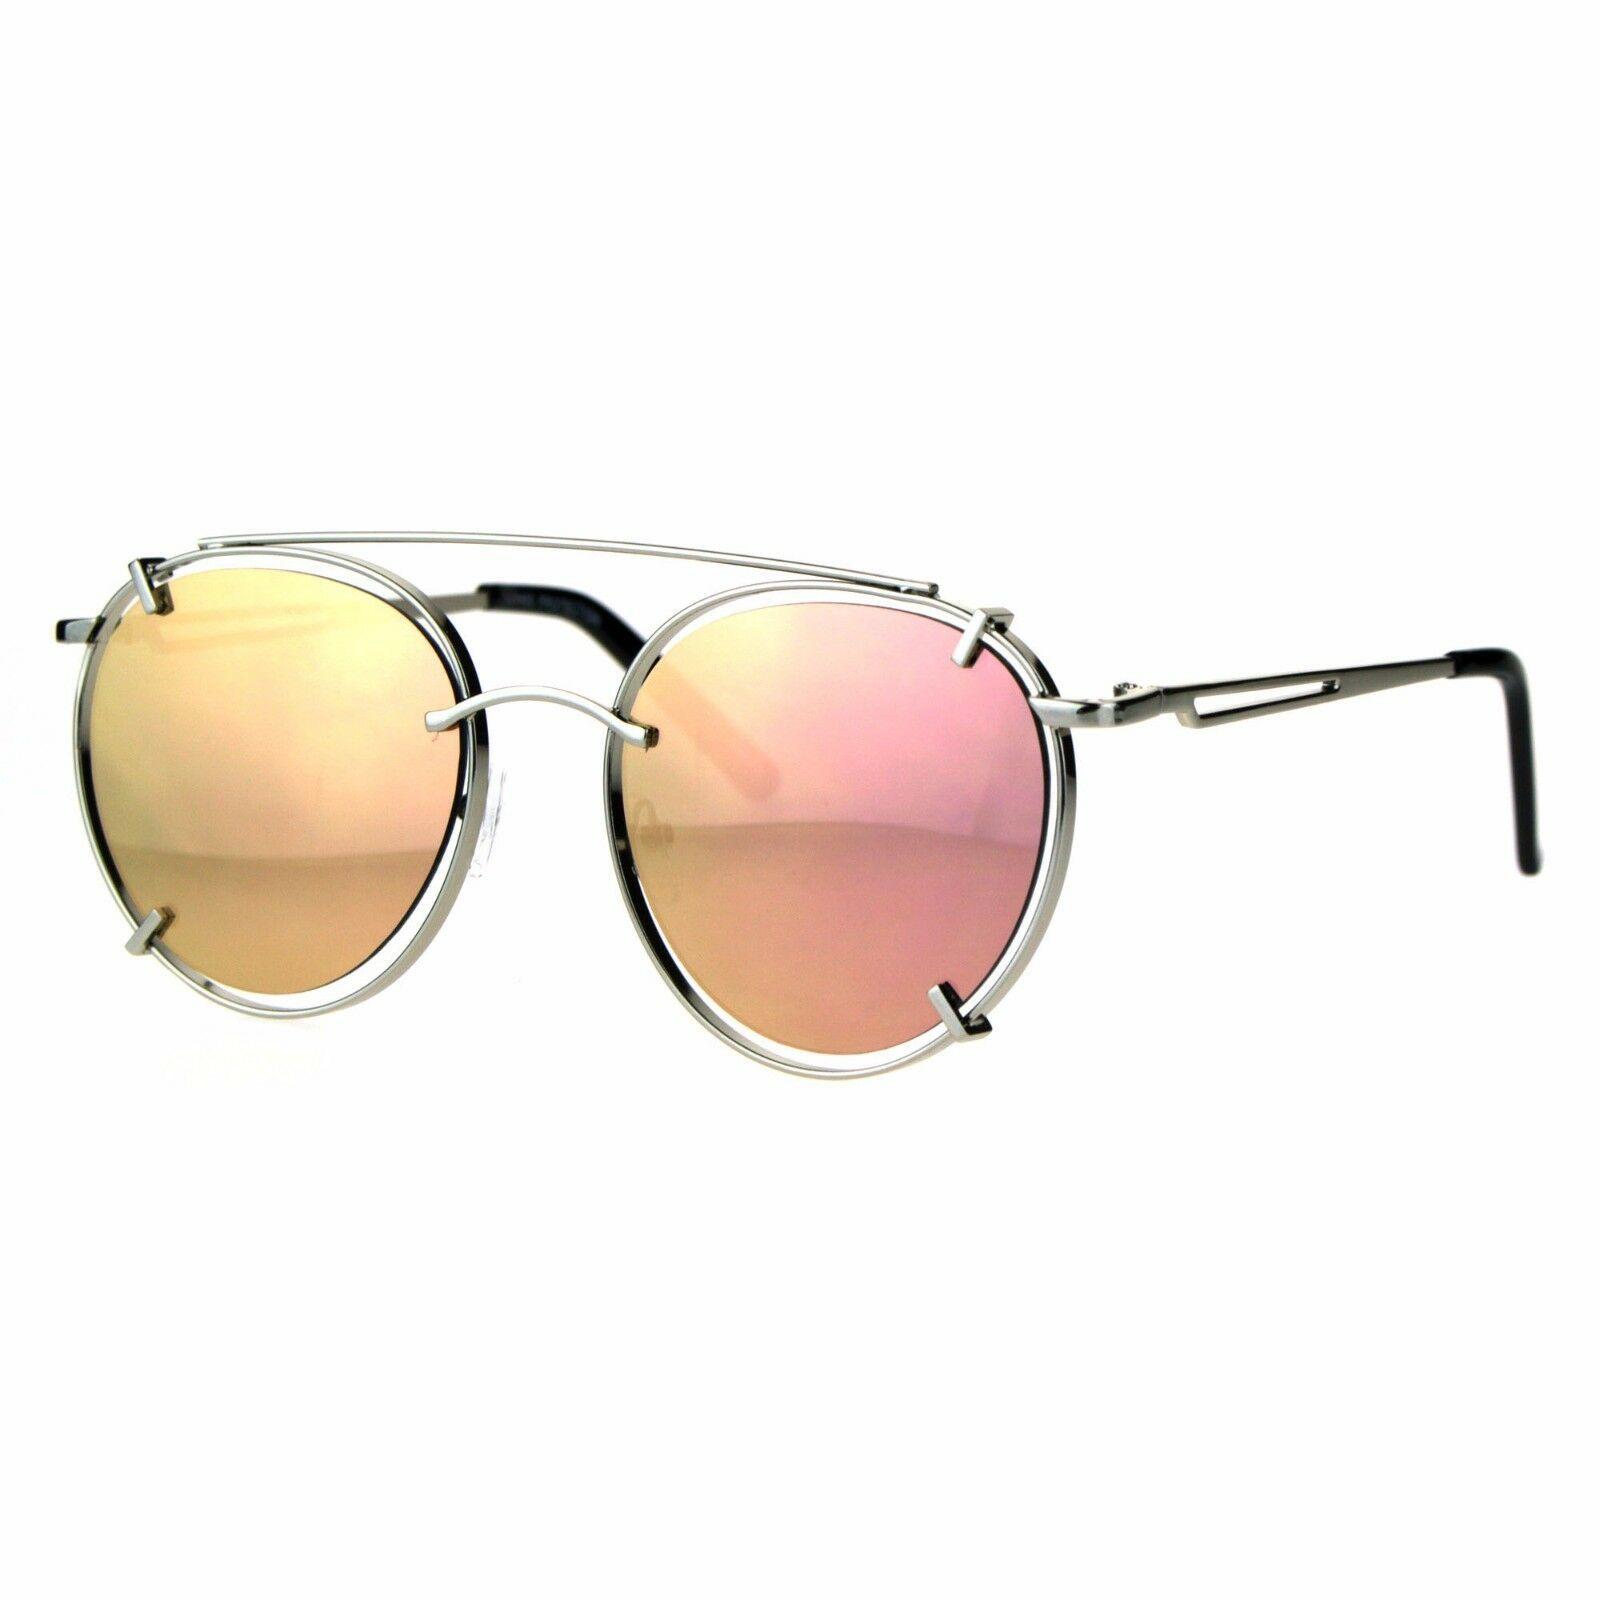 Pink Mirrored Lens Sunglasses Vintage Retro Fashion Round Aviator UV 400